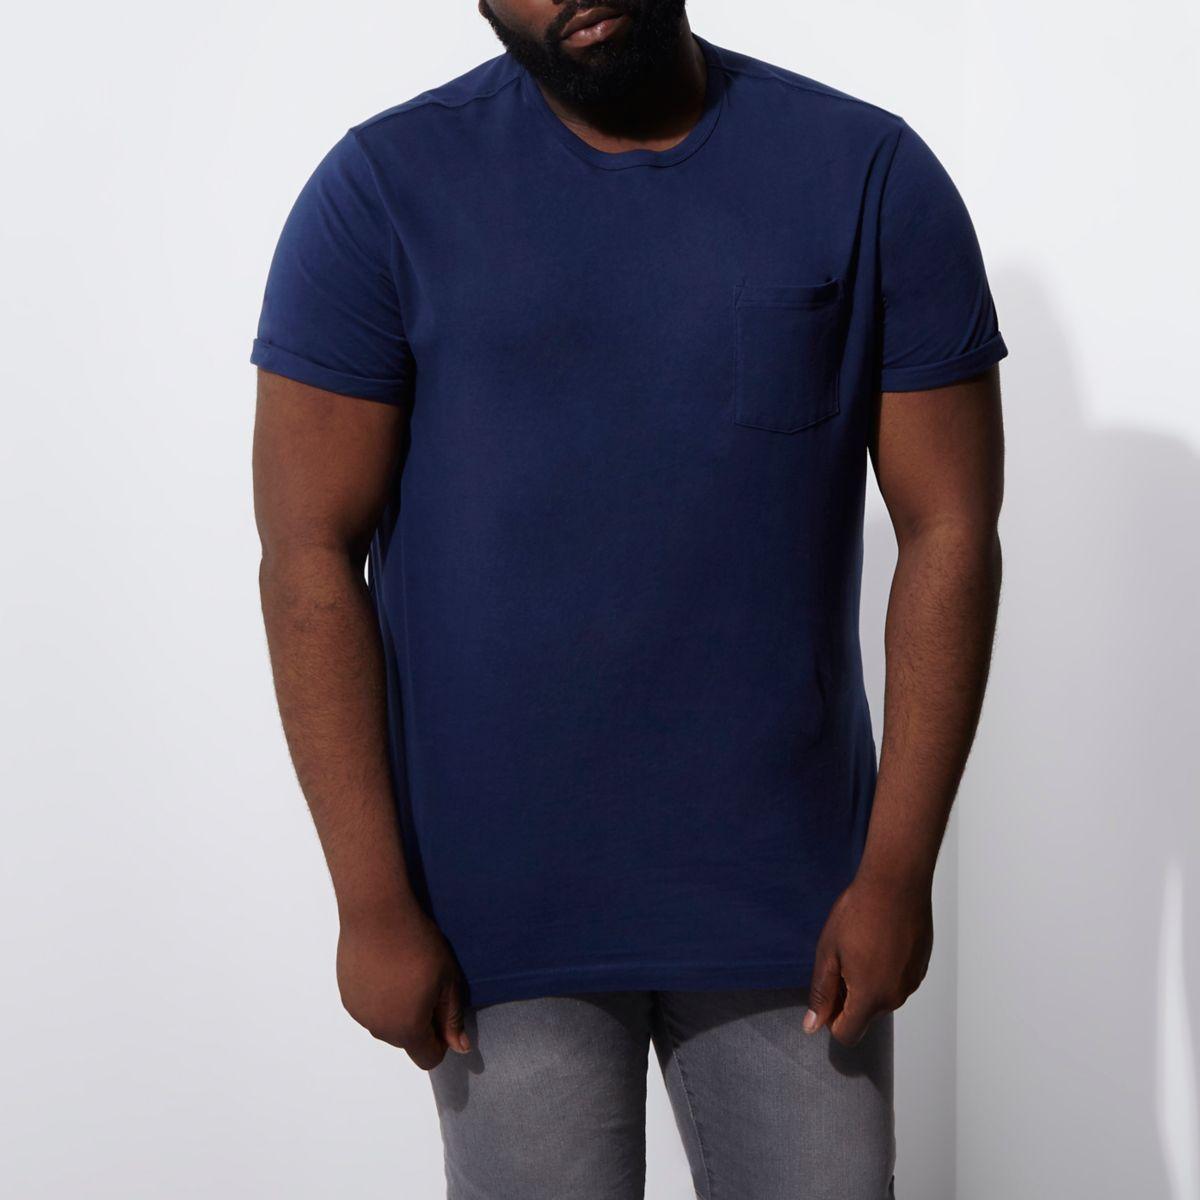 Big and Tall – T-shirt bleu marine à manches retroussées